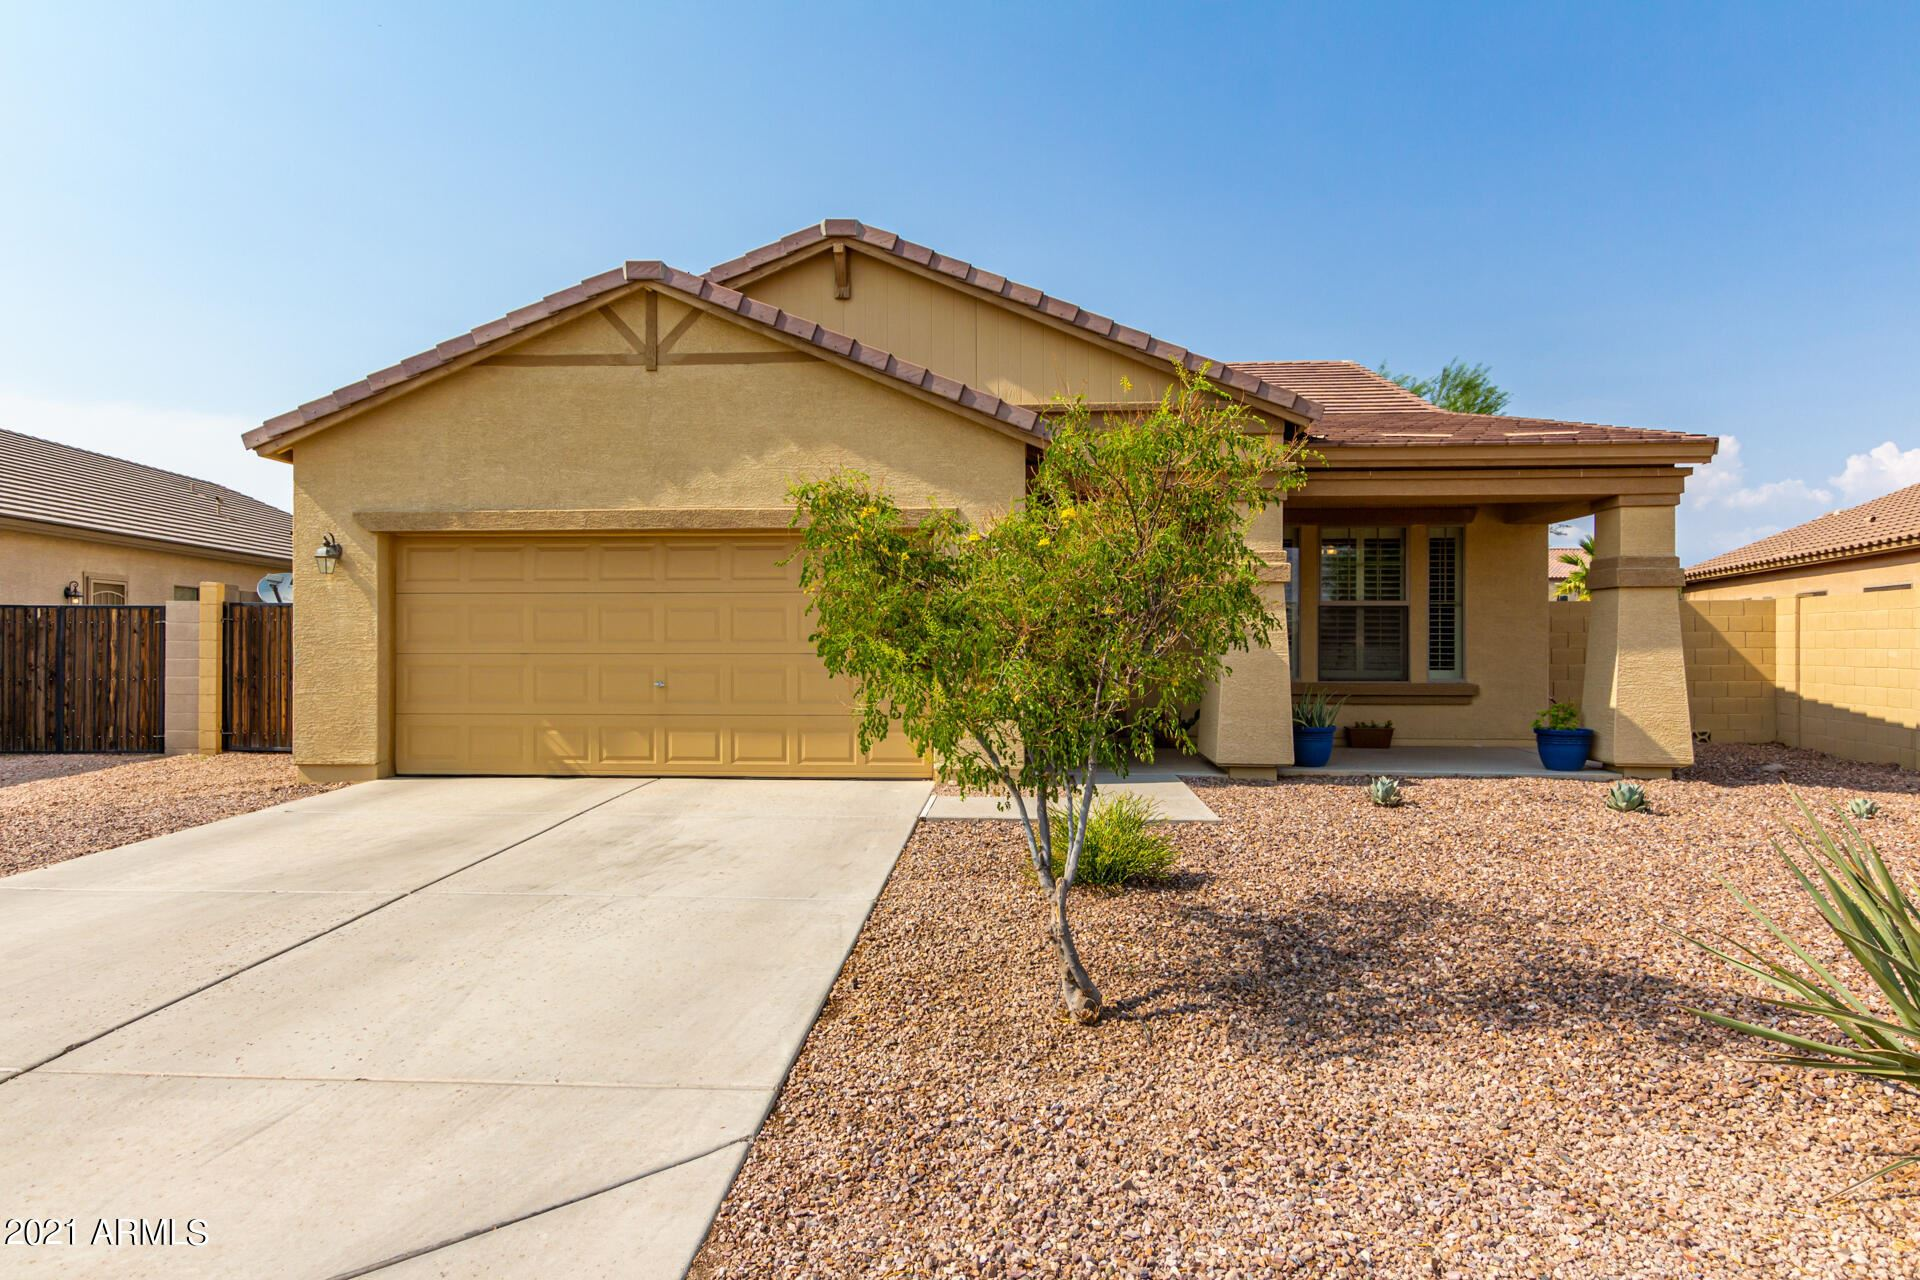 Photo of 38611 N ARMADILLO Drive, San Tan Valley, AZ 85140 (MLS # 6268397)